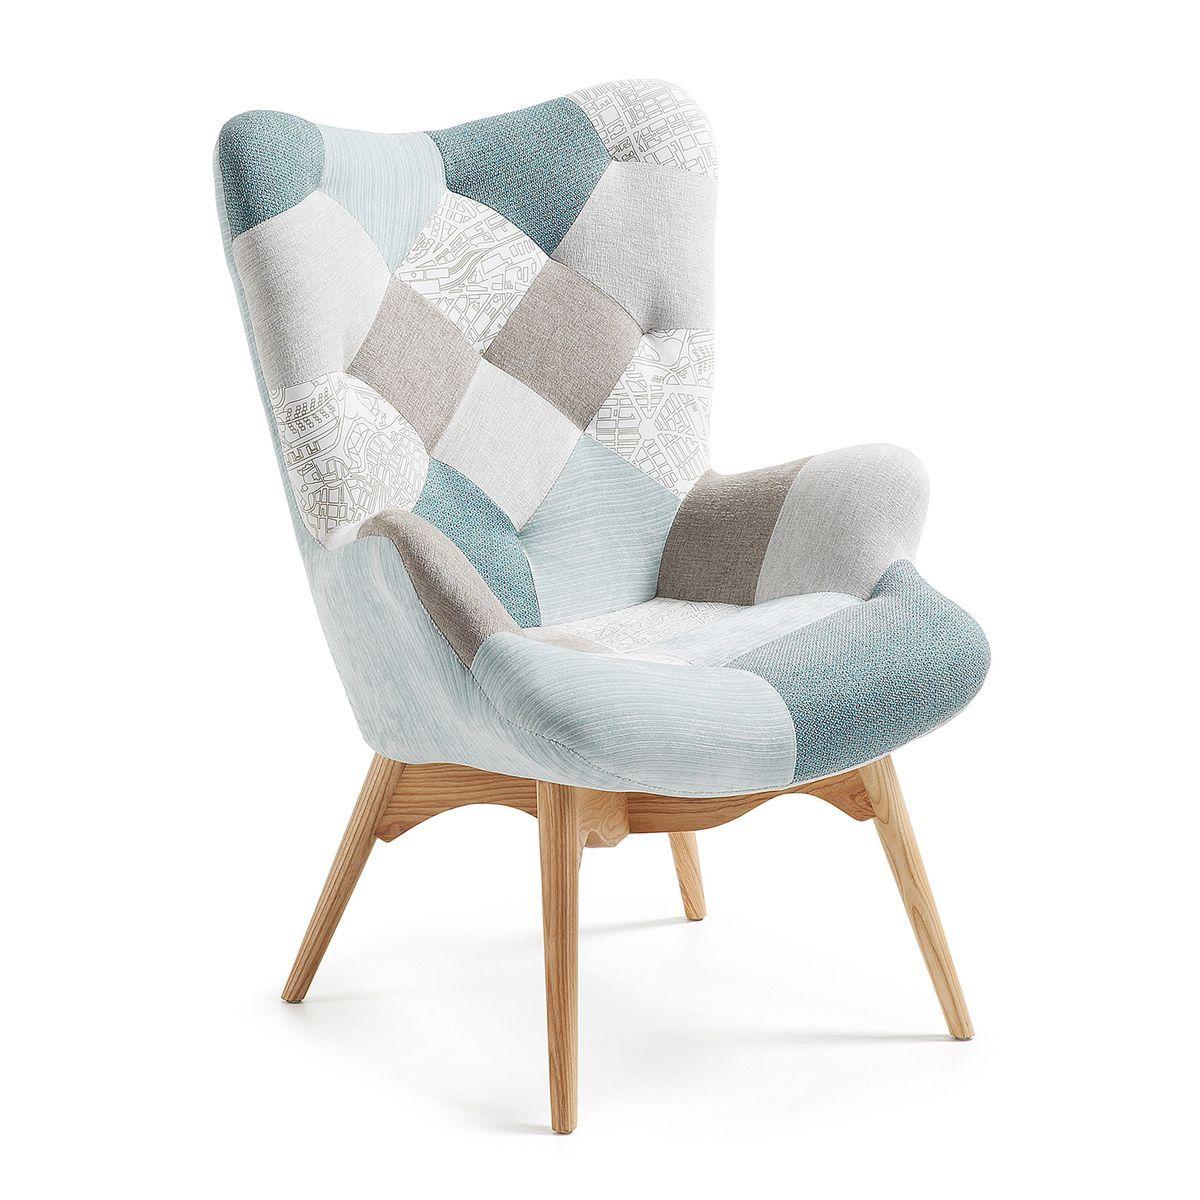 Fauteuil Kody Patchwork Bleu Taille Taille Unique Chair Kave Home Armchair Design